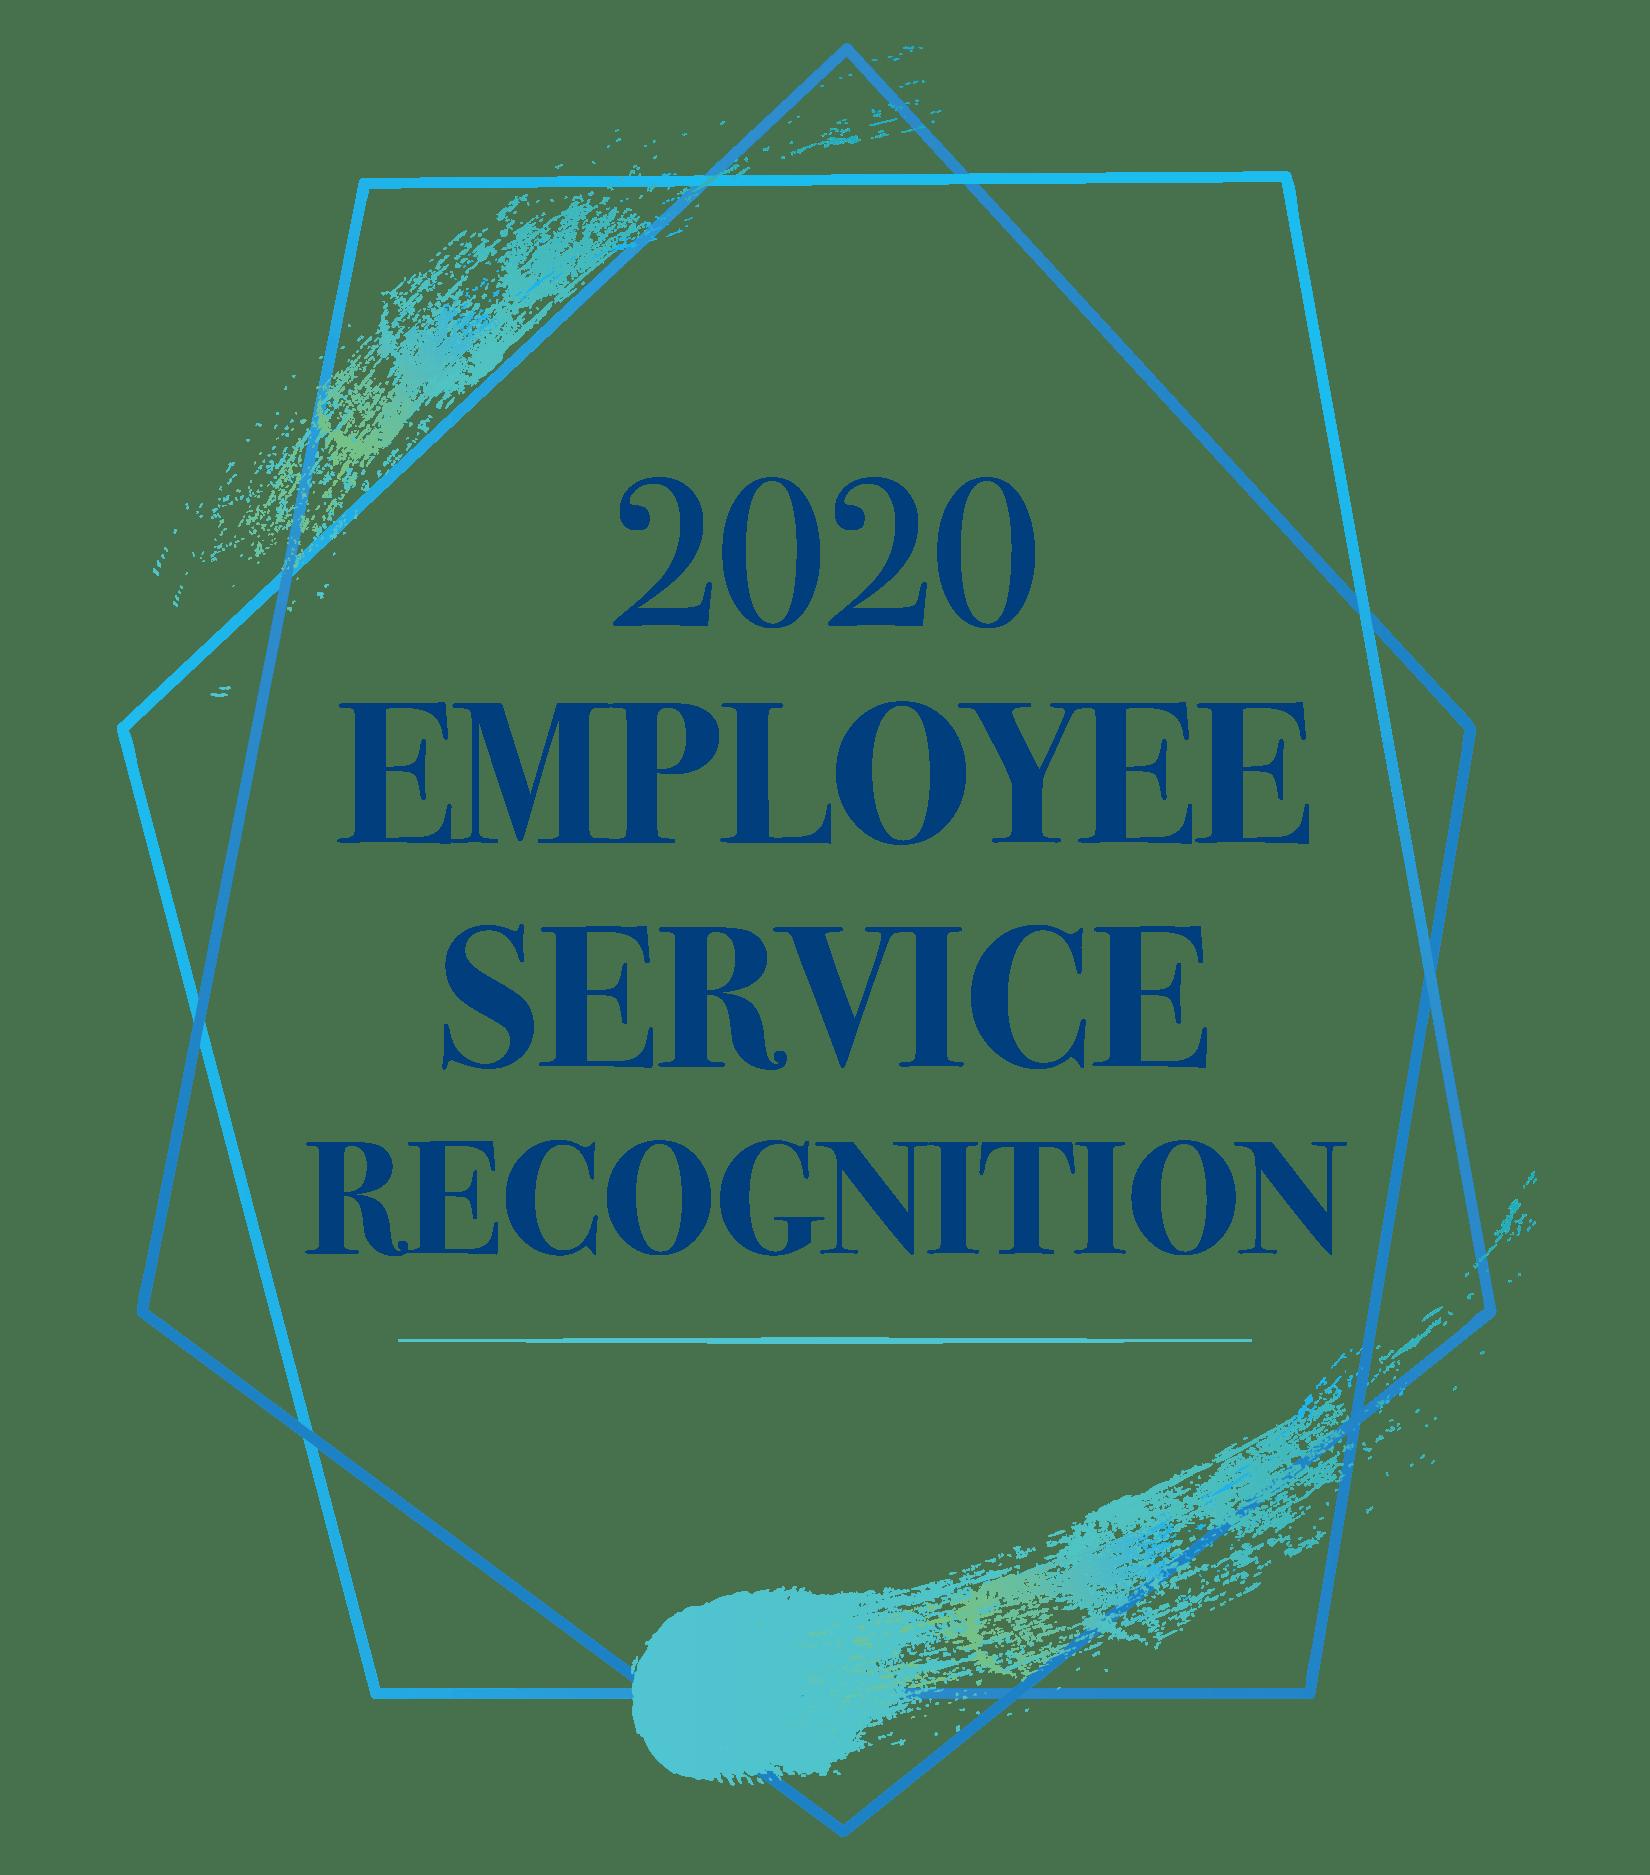 decorative image of 55536-EmployeeServiceRECOGNITION , Employee Service Awards 2020-05-28 08:59:21